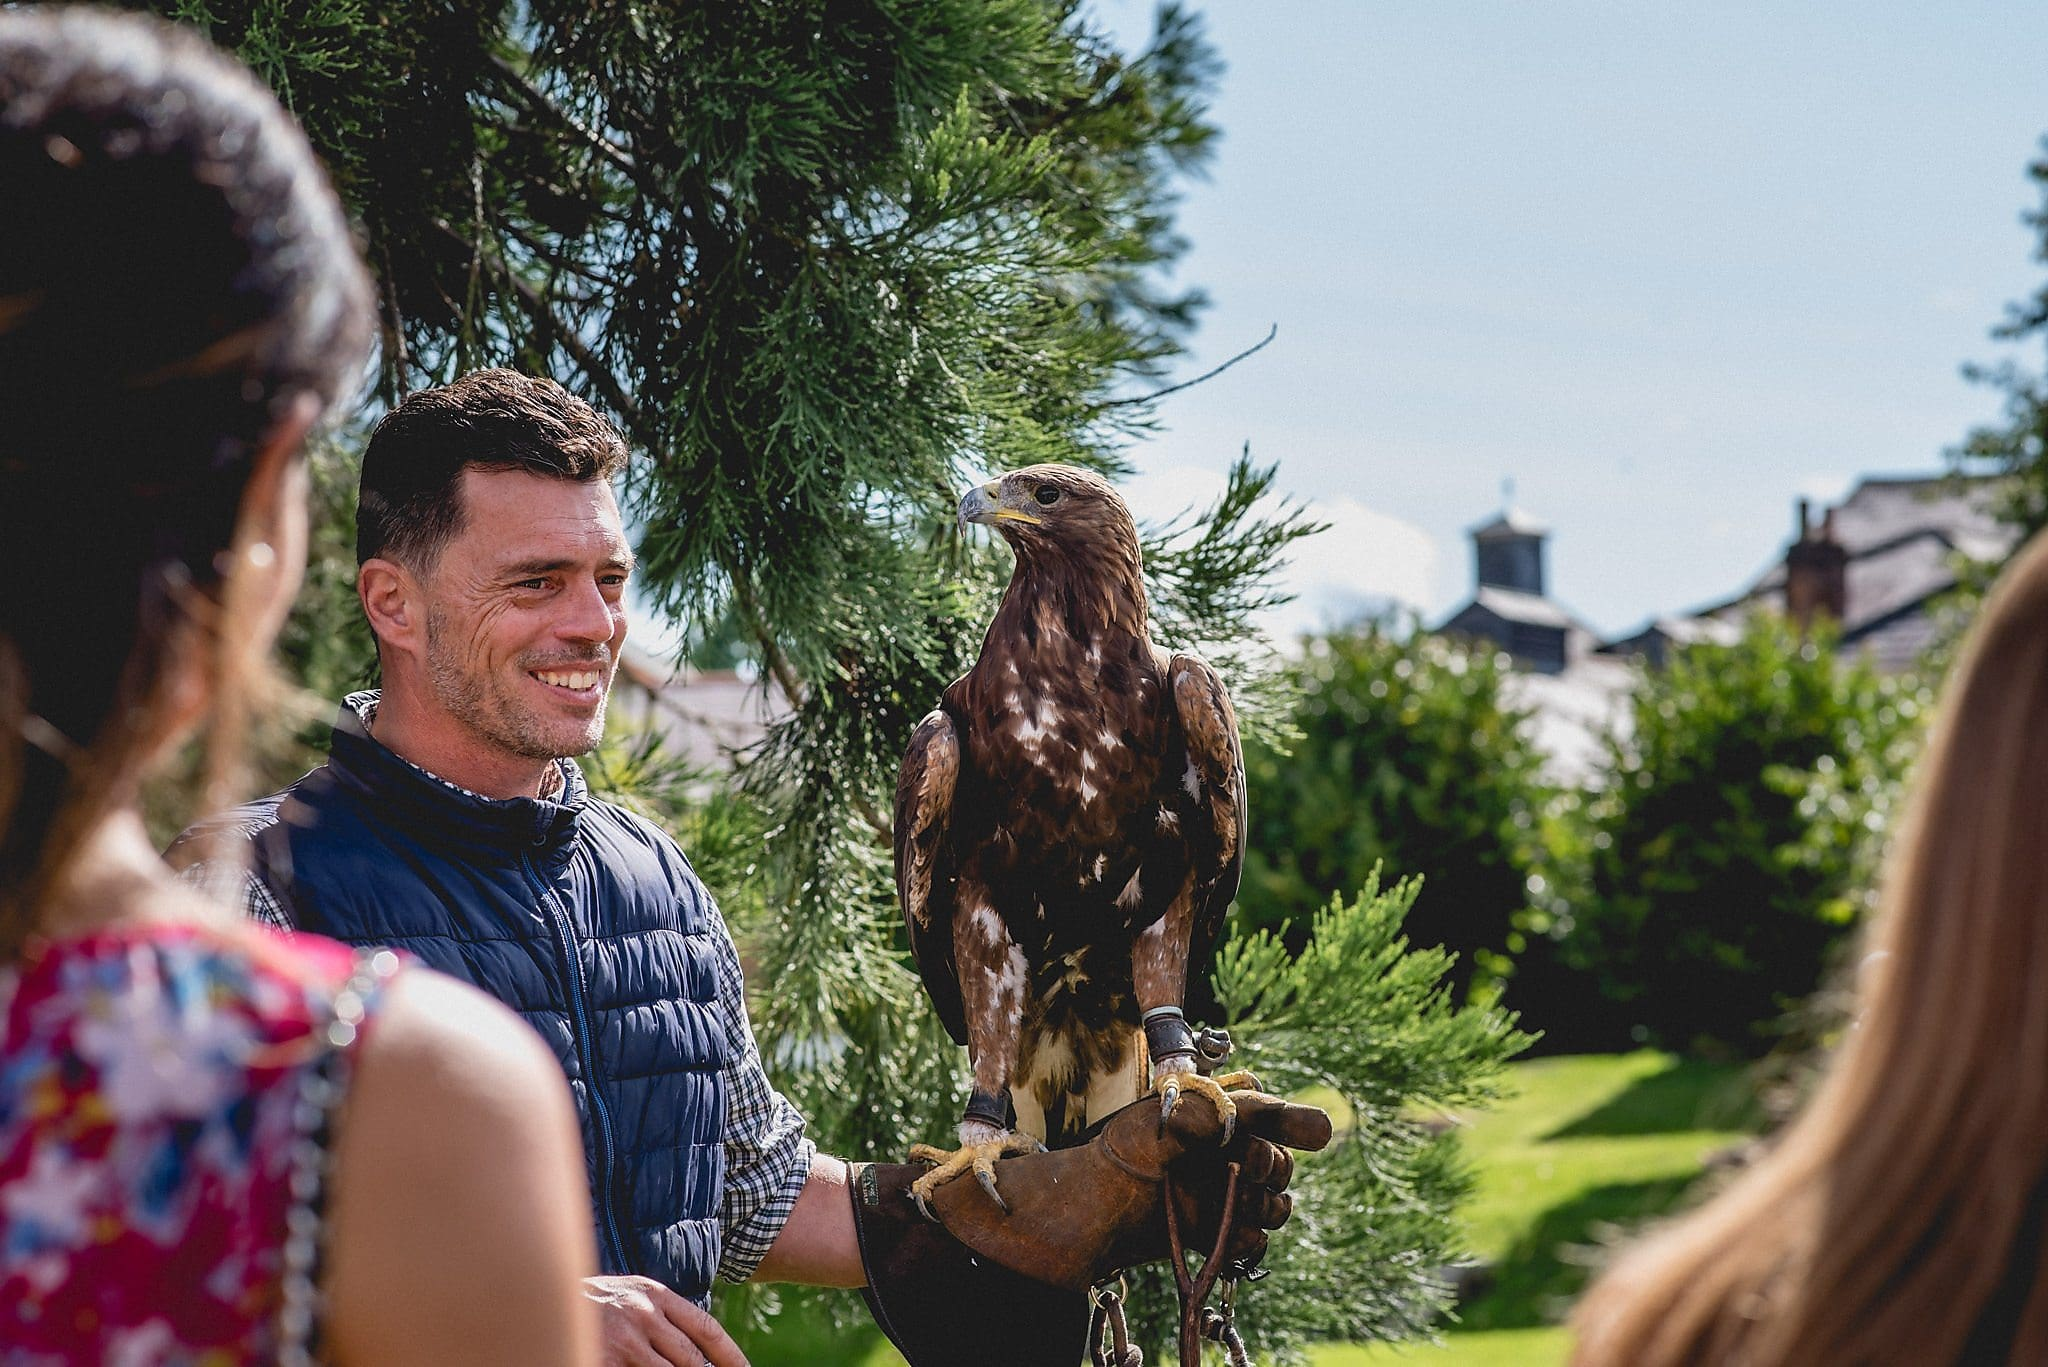 Bird of prey sits on handler's arm at wedding reception